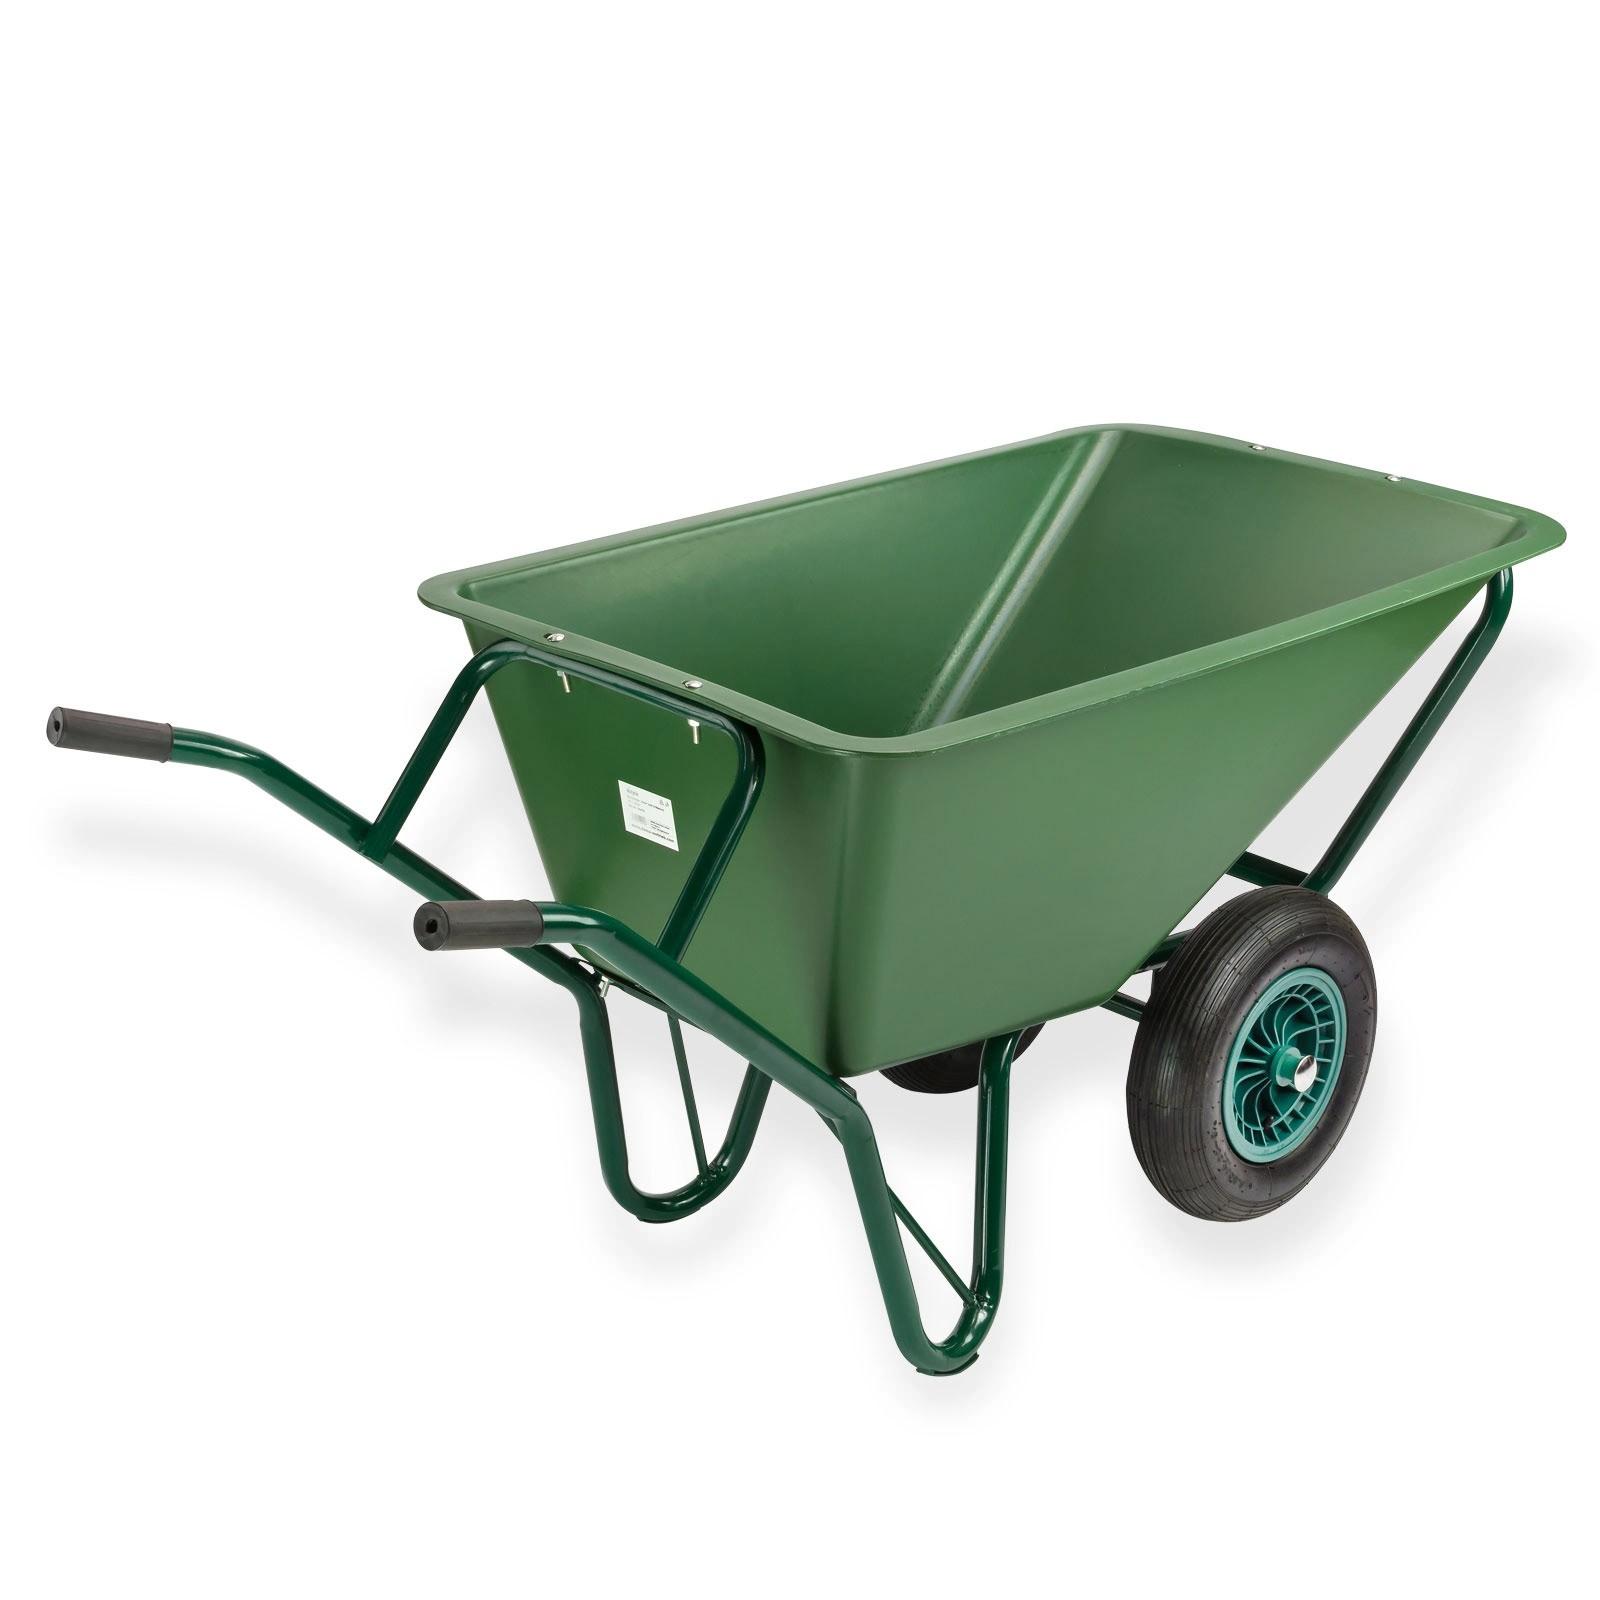 gartenschubkarre schubkarre schiebkarre hofkarre karre 130 liter 150 kg. Black Bedroom Furniture Sets. Home Design Ideas